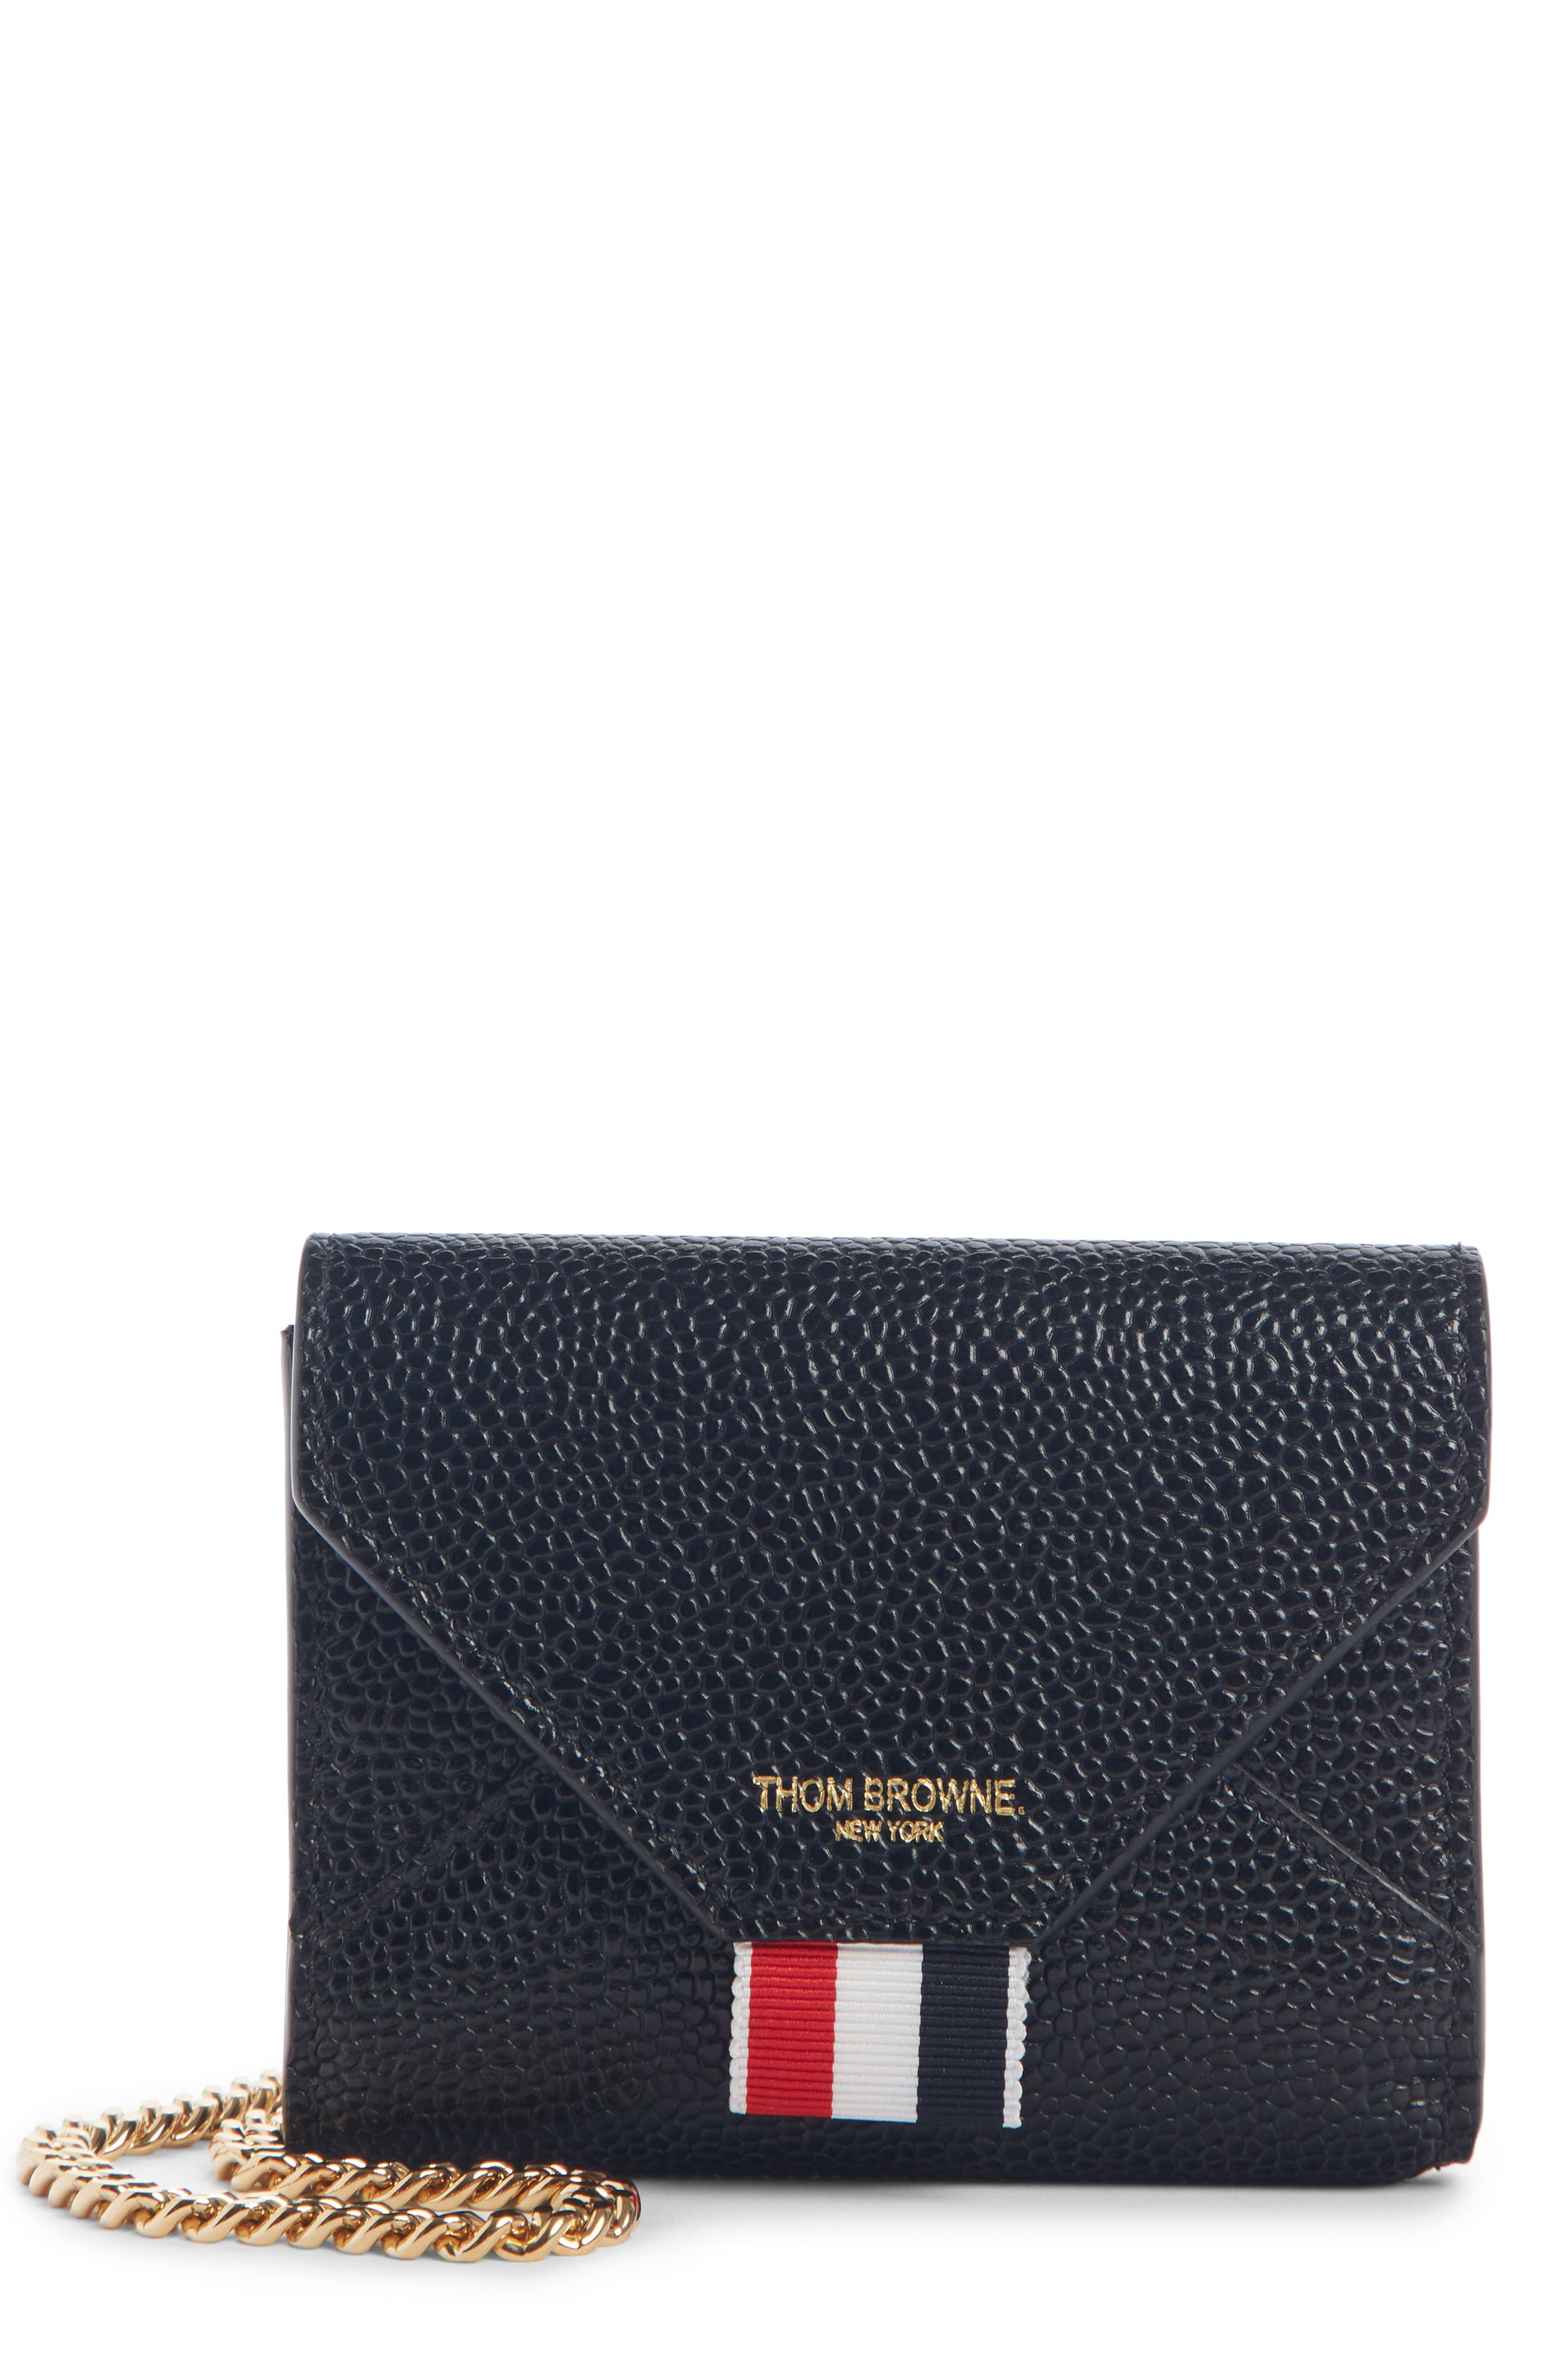 d67167c783 Women's Thom Browne Designer Handbags & Wallets   Nordstrom